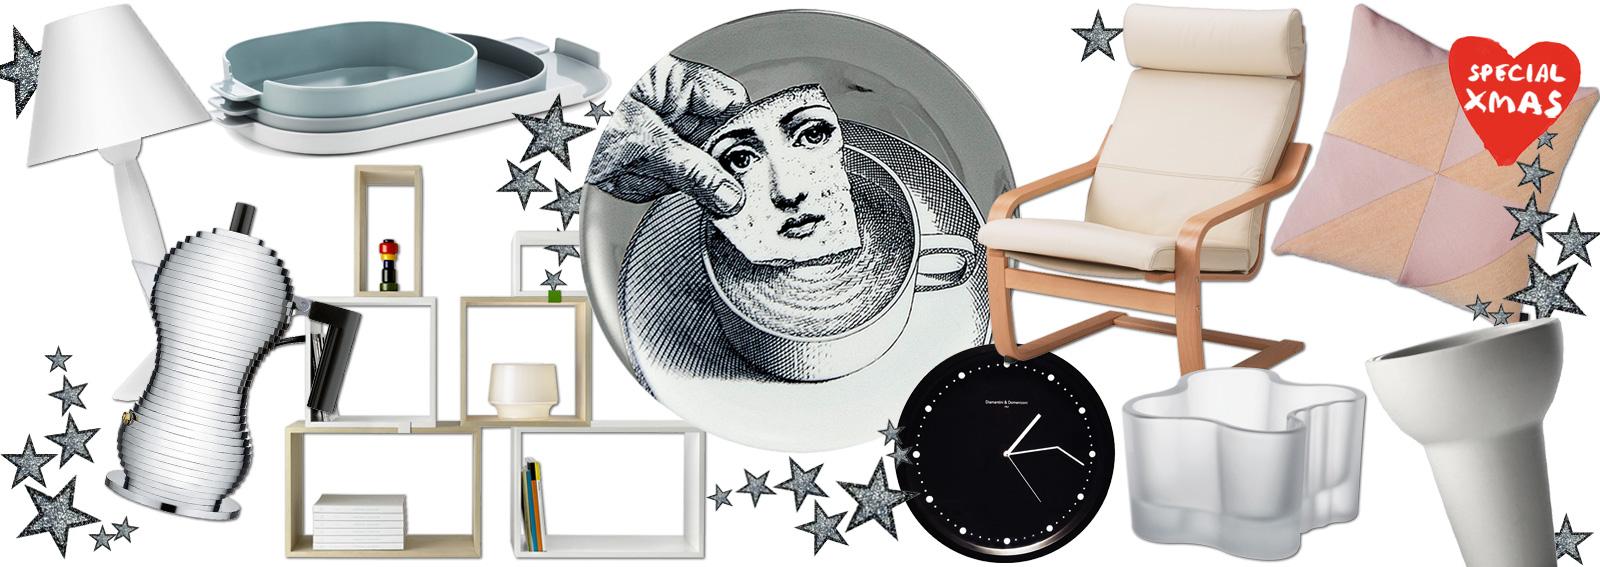 cover-regali-di-natale-economici-design-desktop